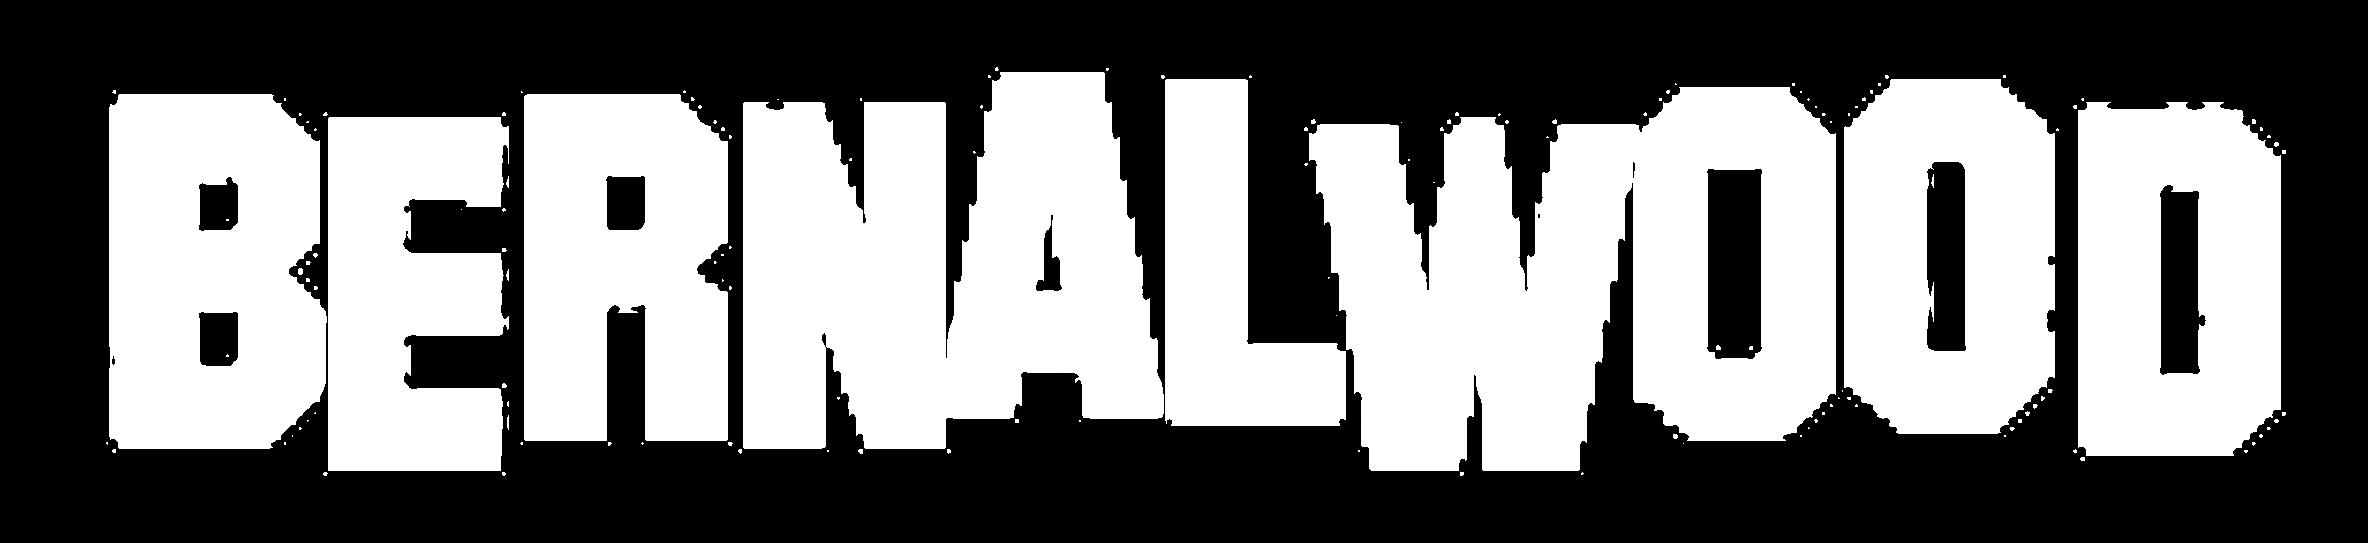 Bernalwood logo